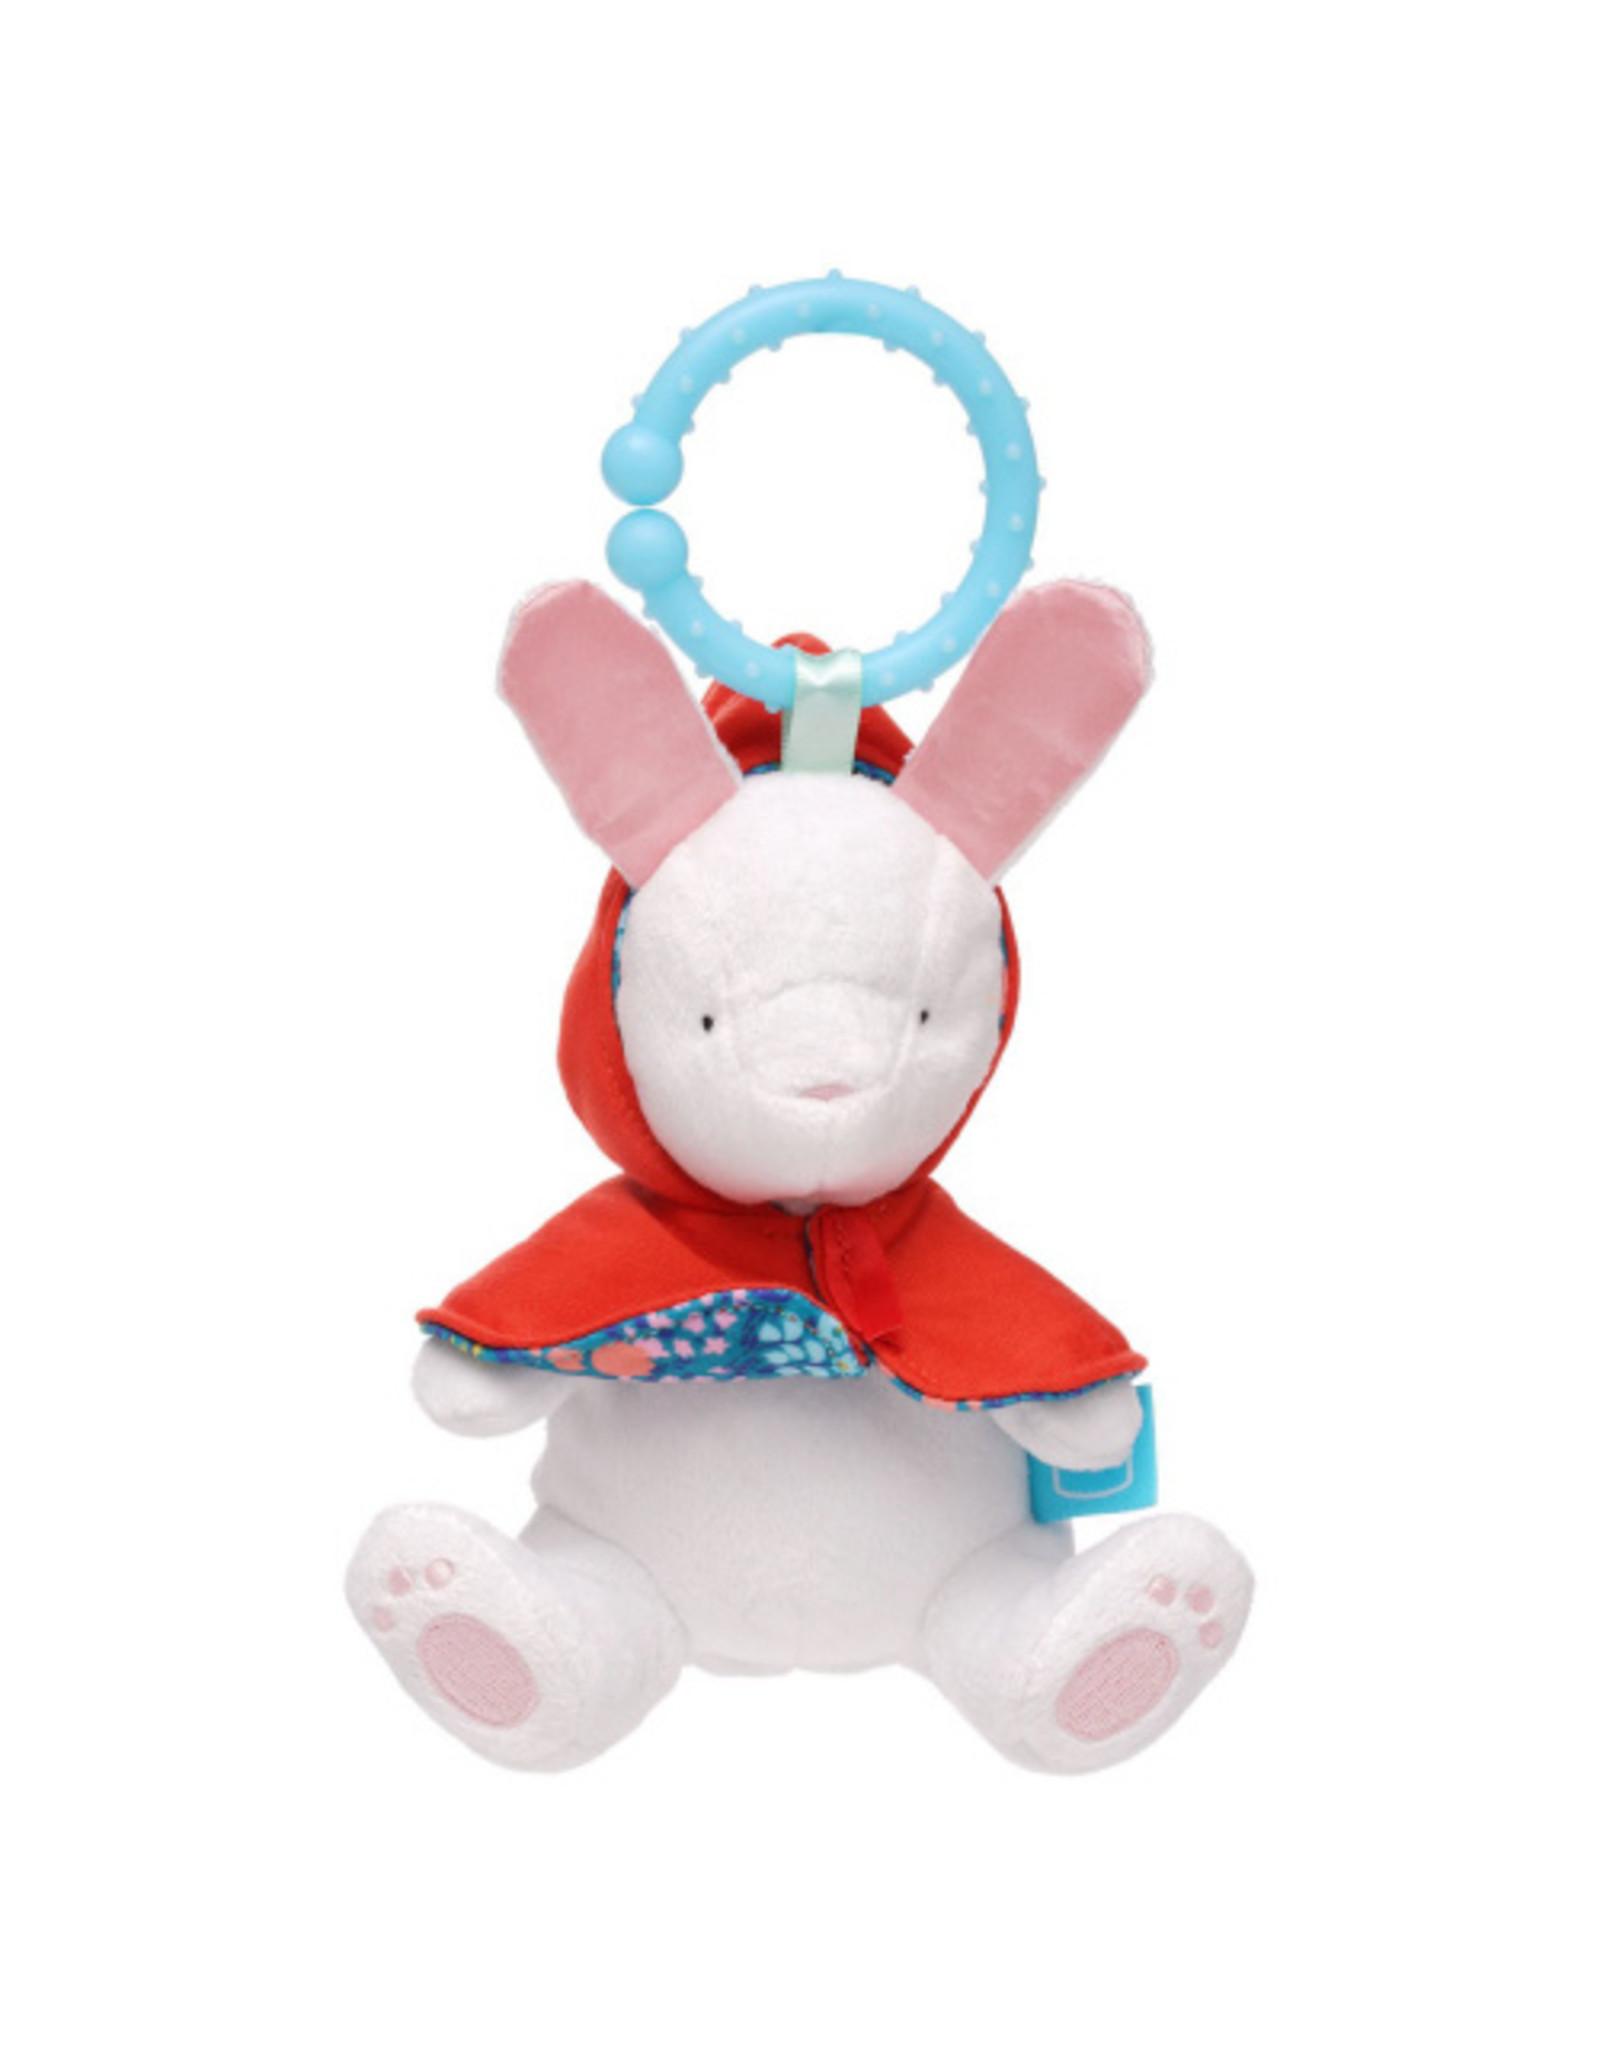 Manhattan Toy Fairytale Rabbit Take Along Toy